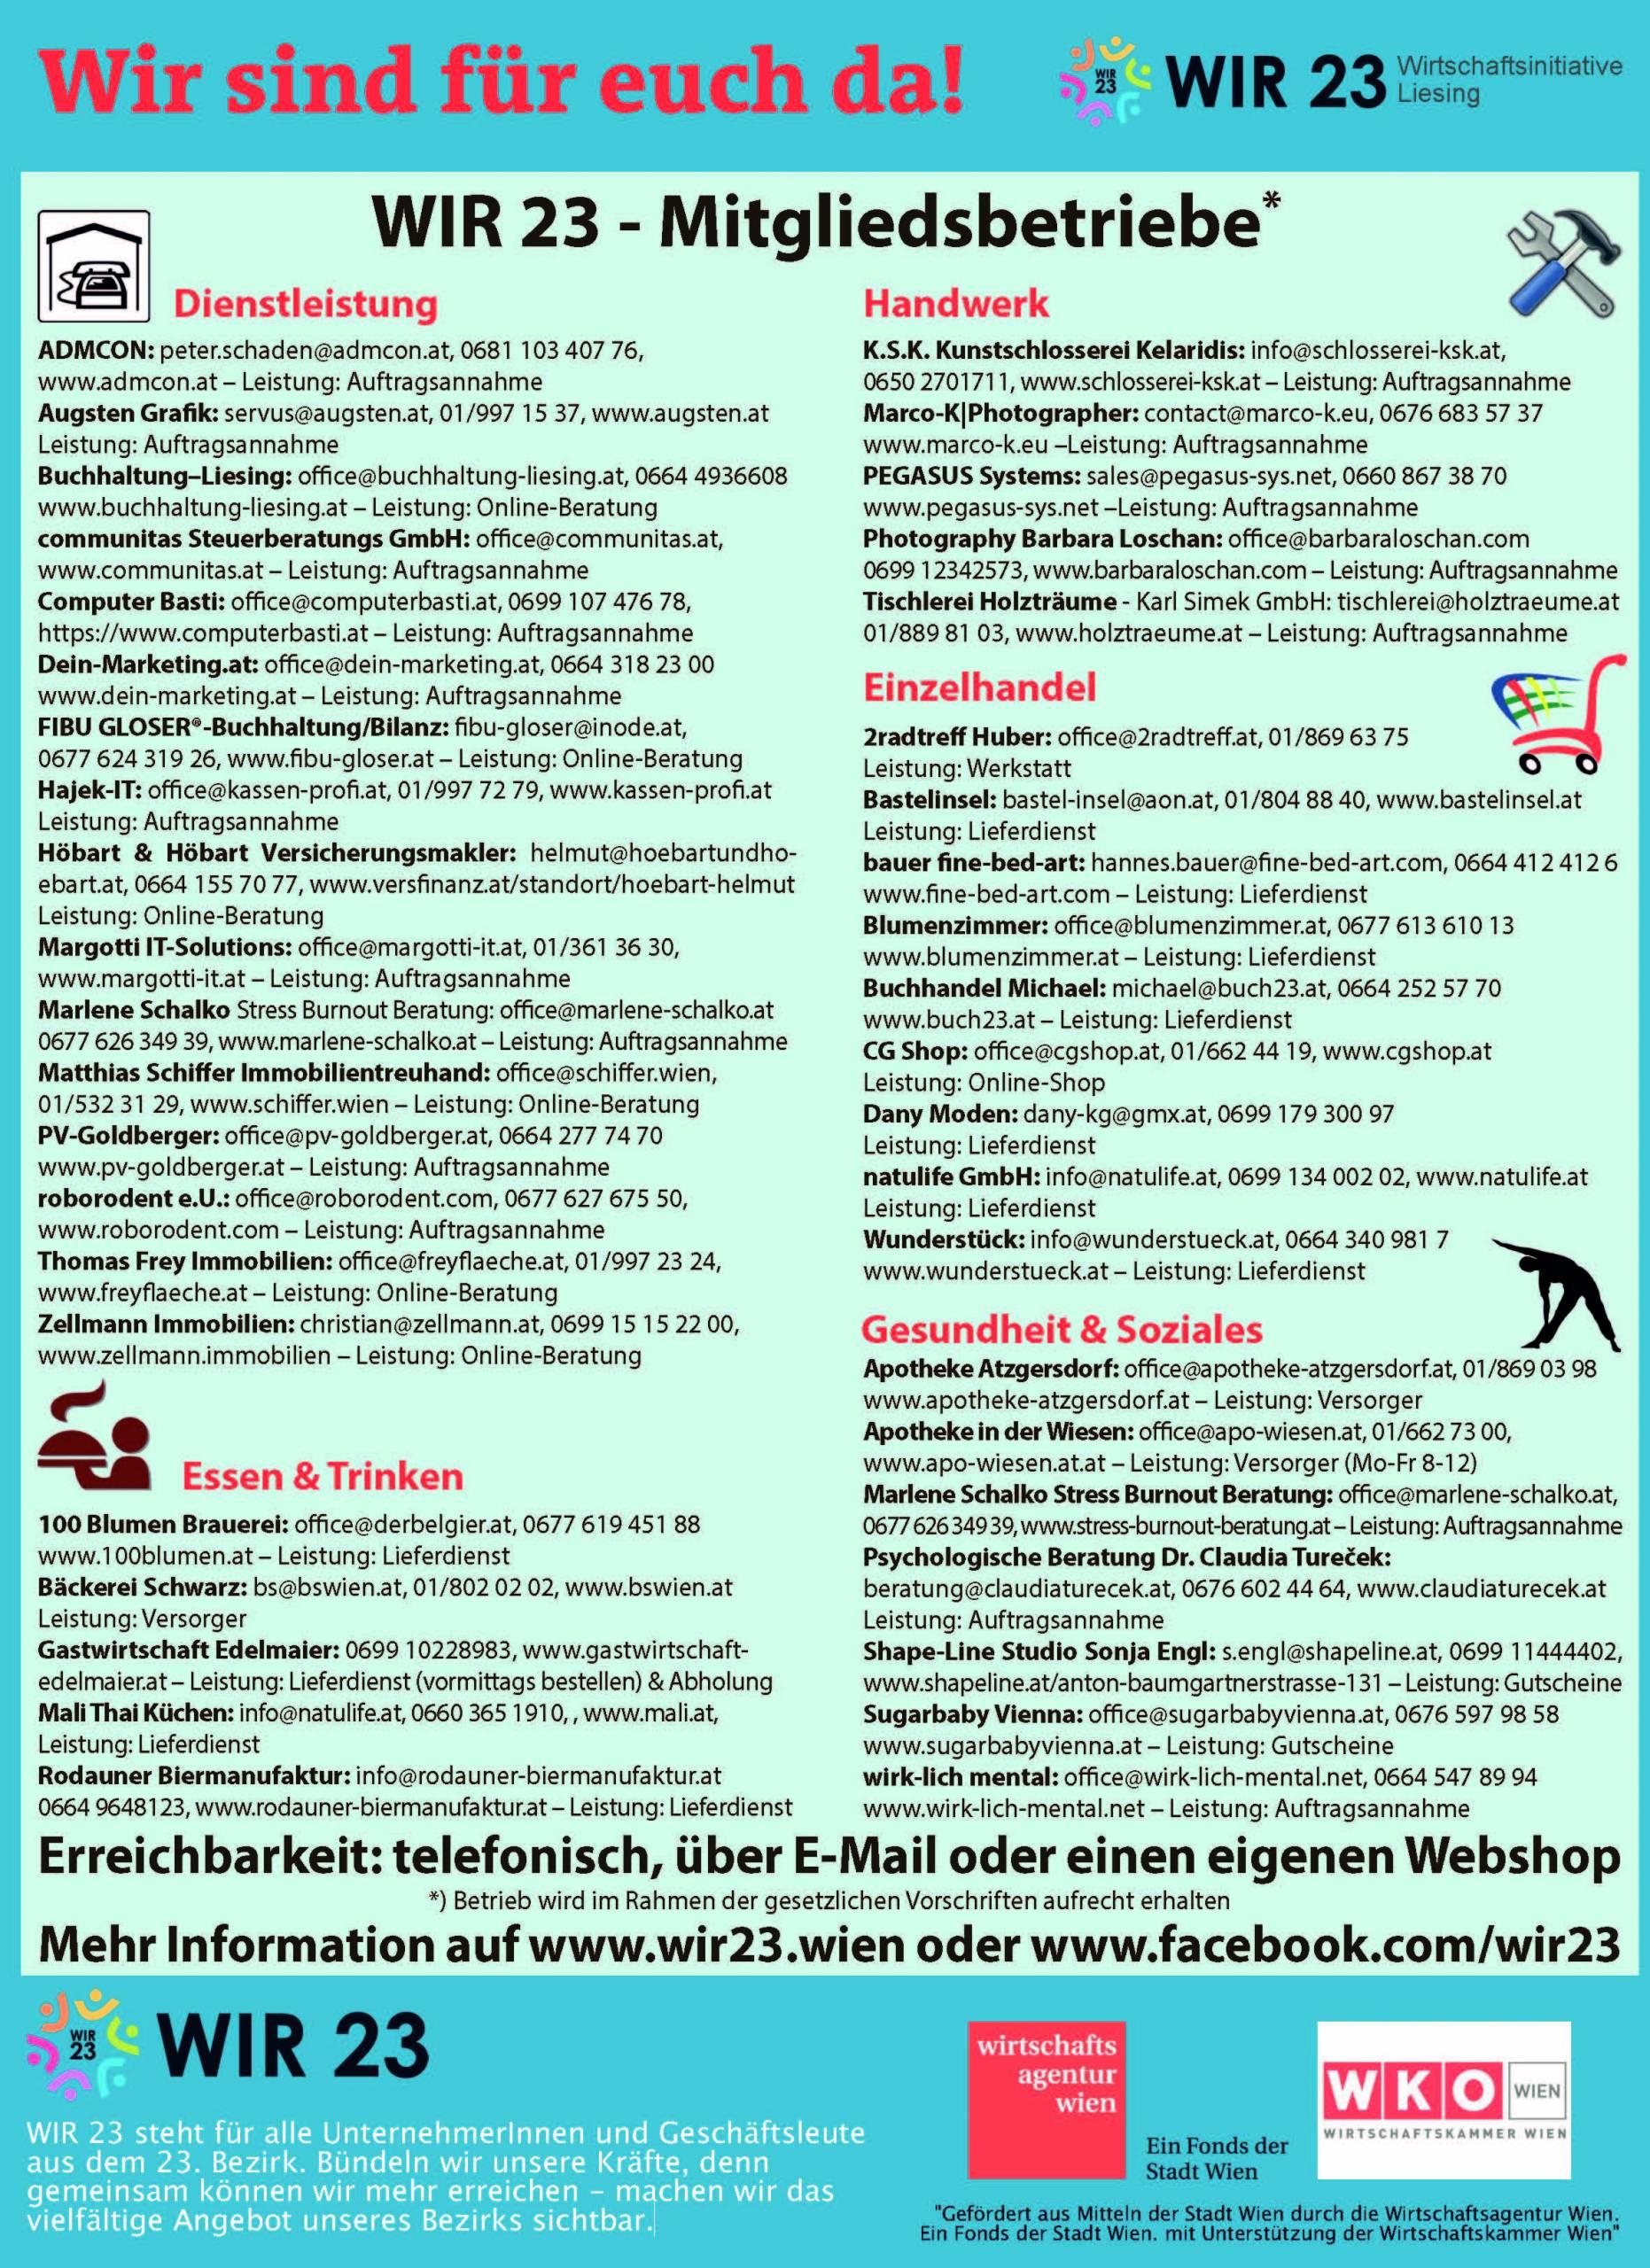 WIR23 Liste